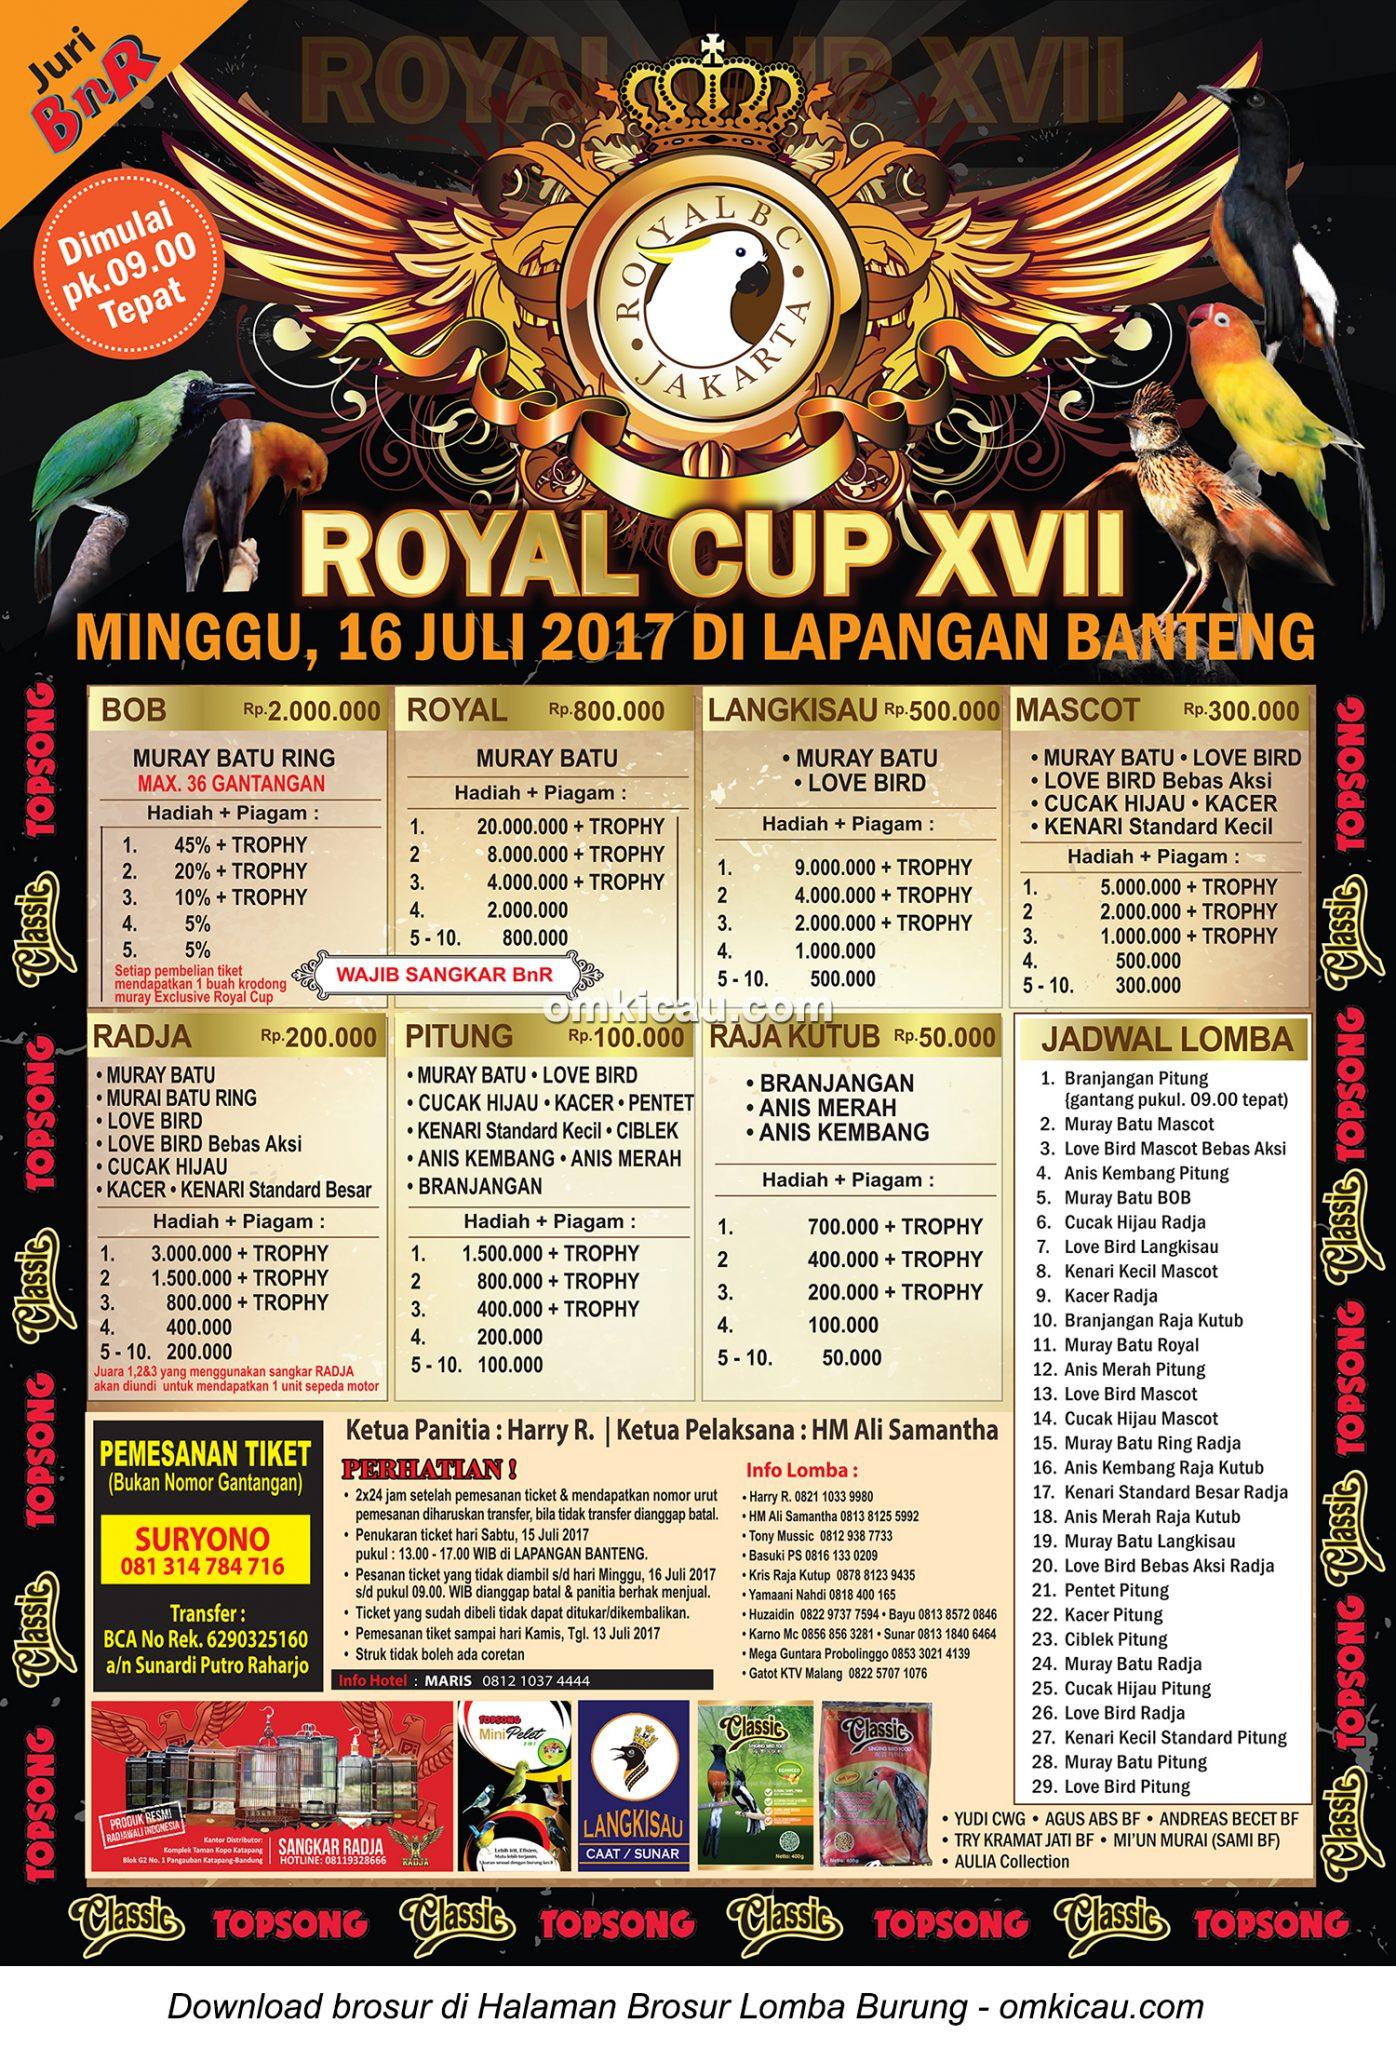 Brosur Revisi Lomba Burung Berkicau Royal Cup XVII, Jakarta, 16 Juli 2017